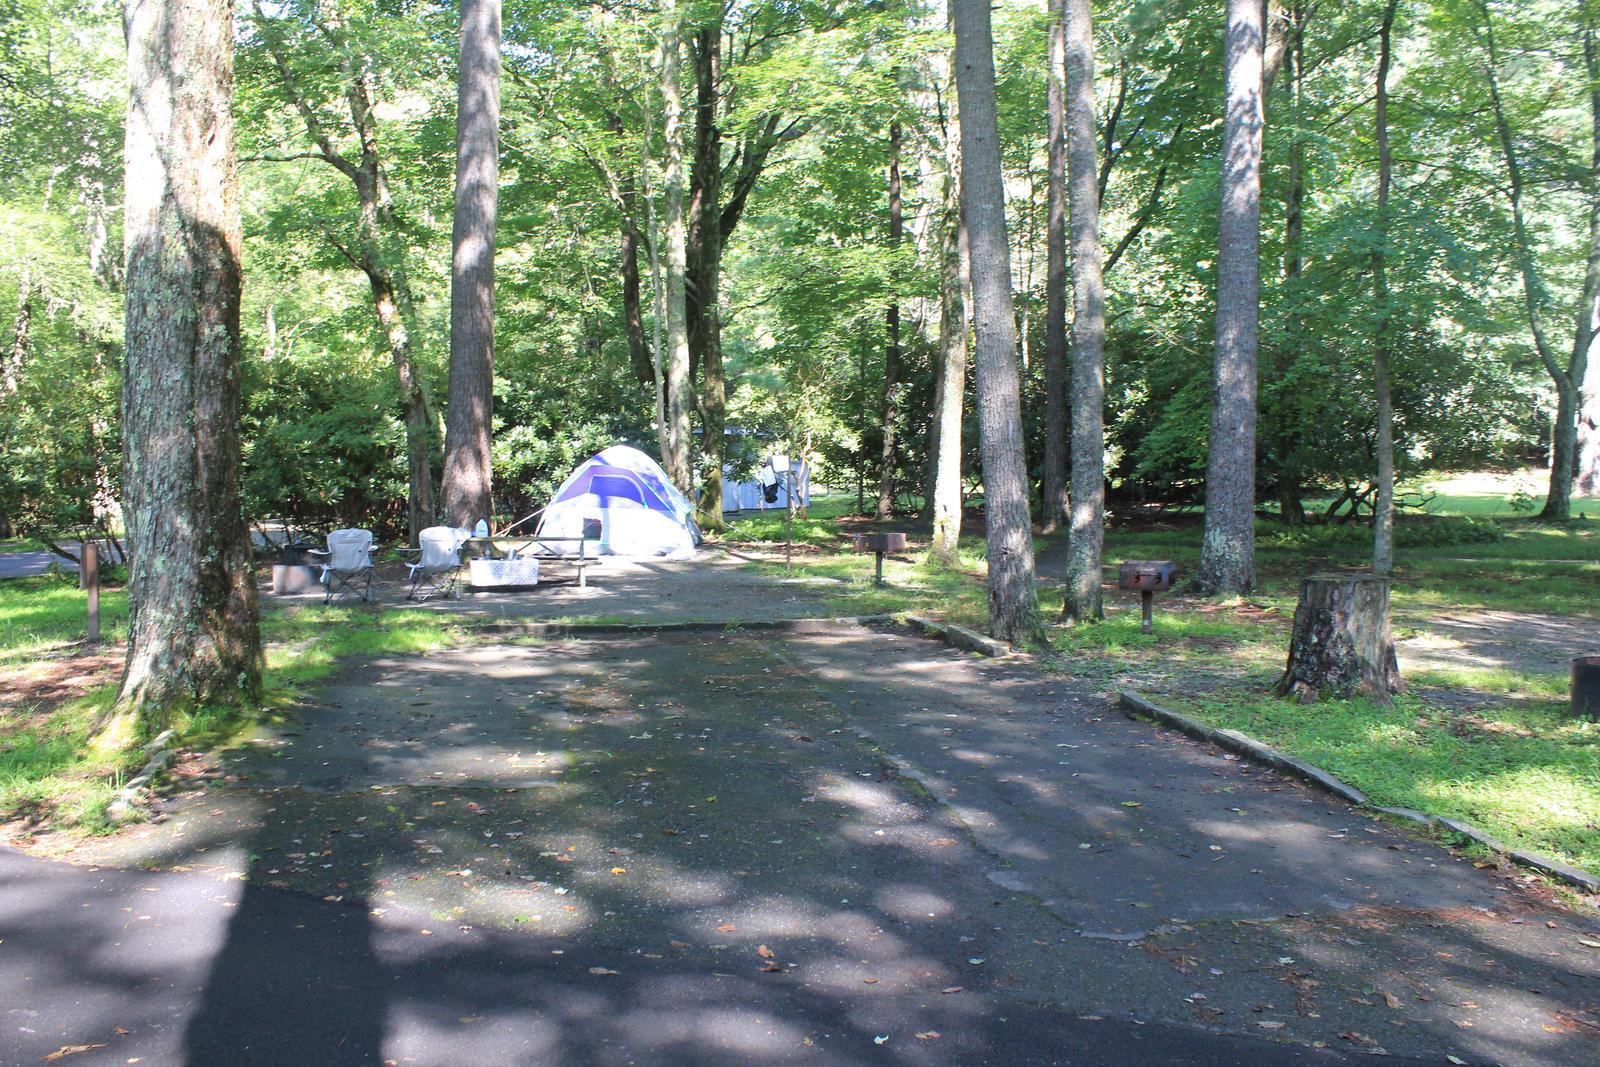 A Loop Site 20 - Tent Nonelectric (Handicap Accessible)